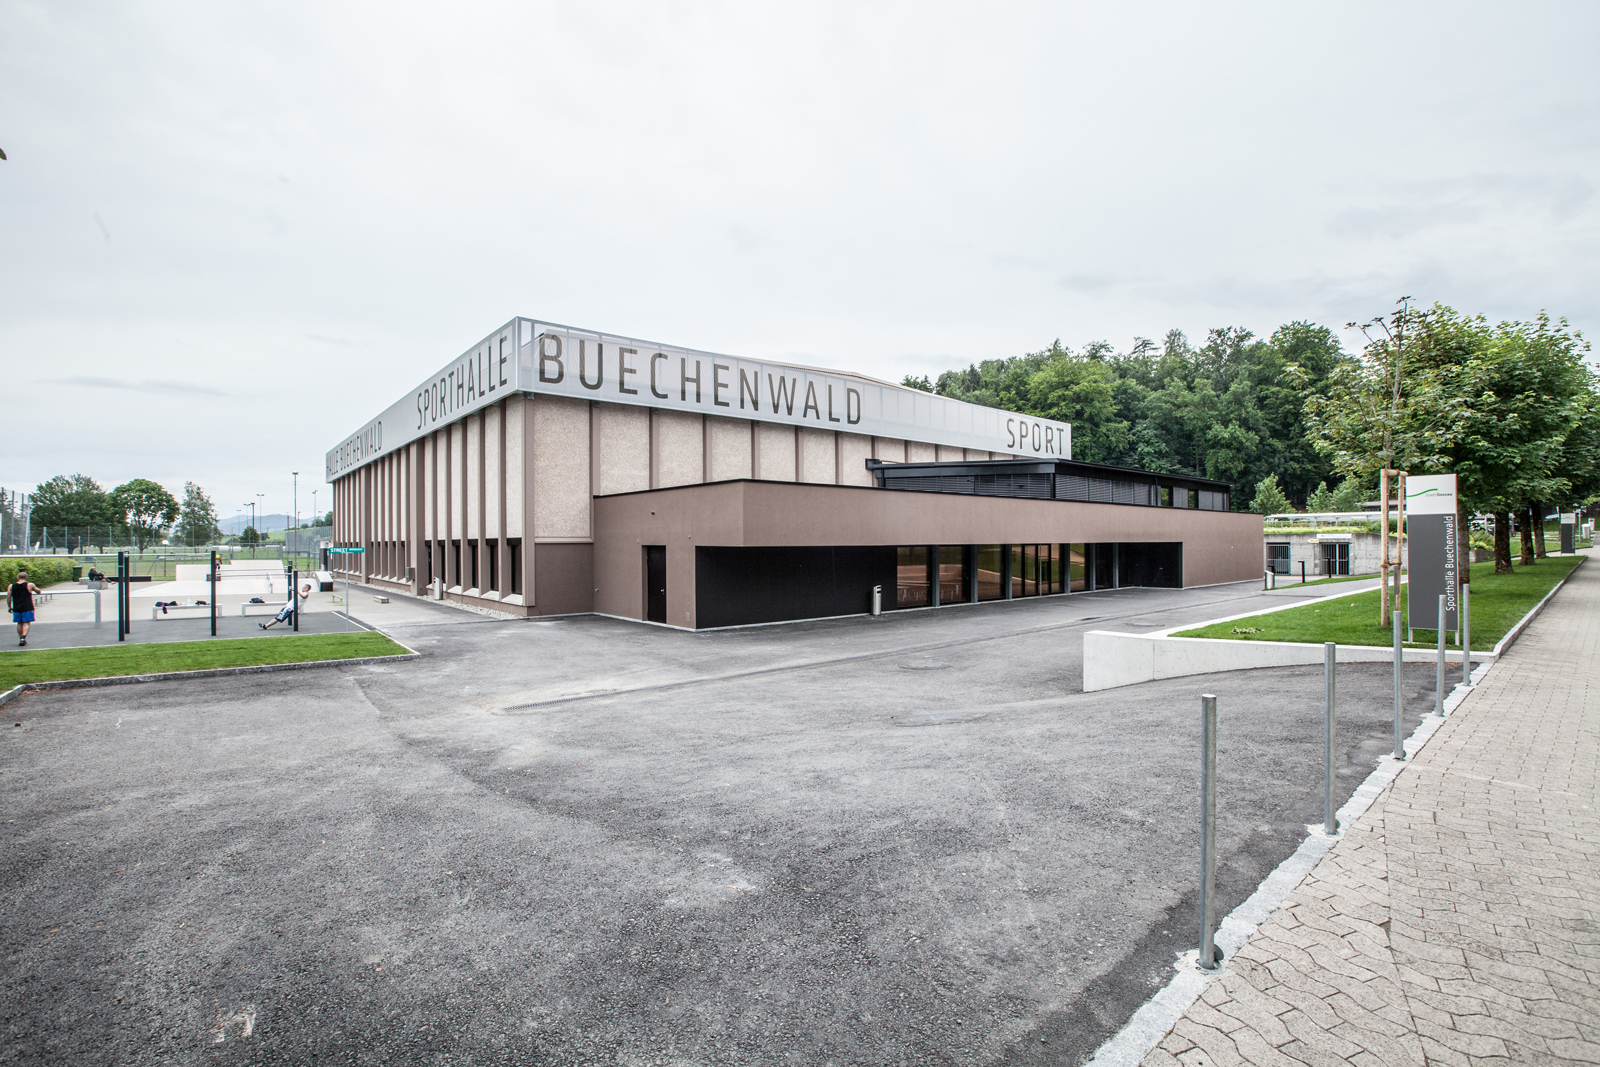 Sporthalle Buechenwald Gossau